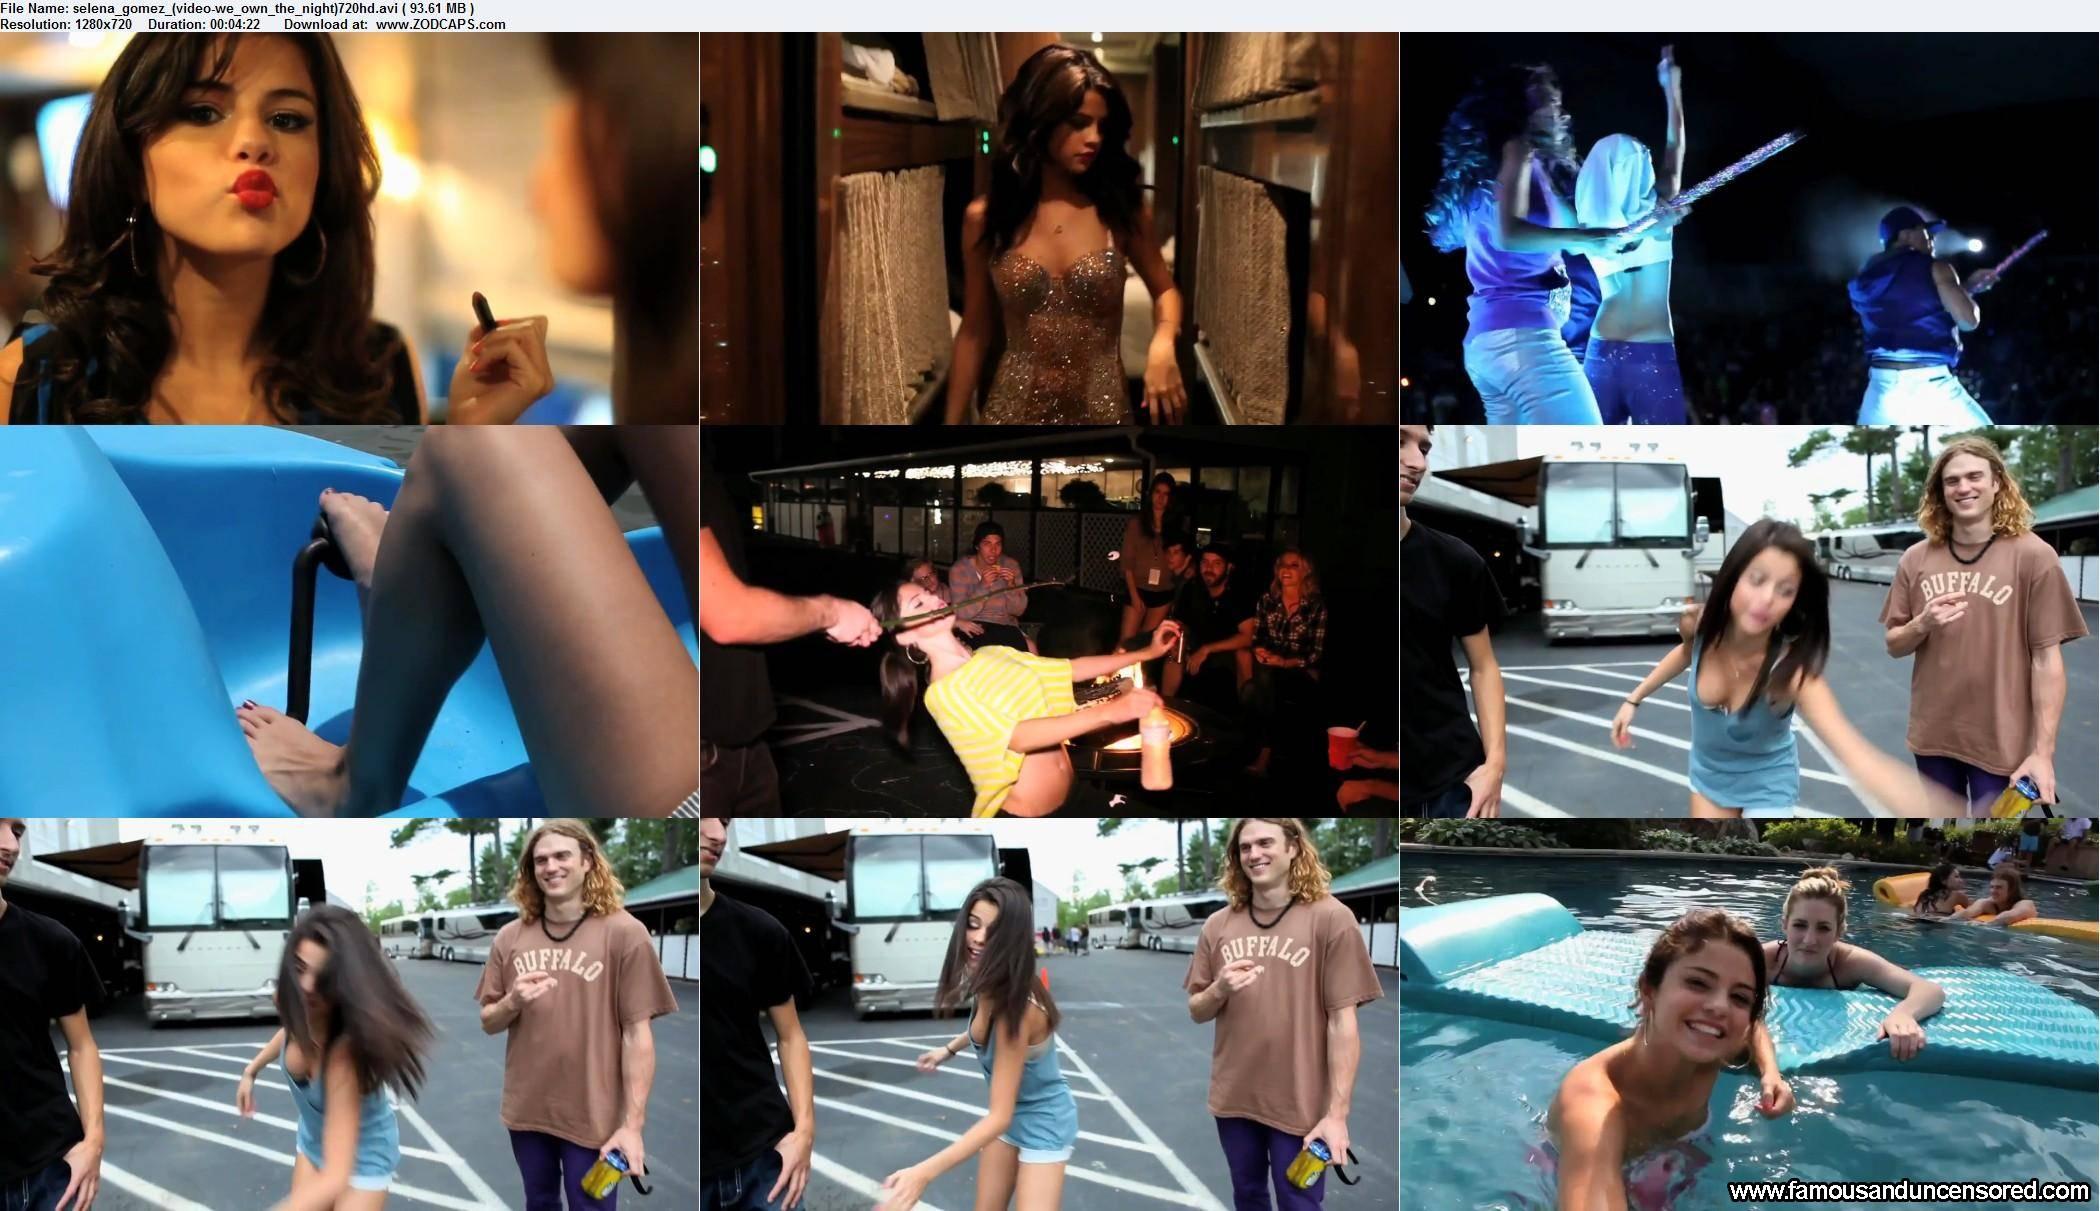 junior nudist photo gallery